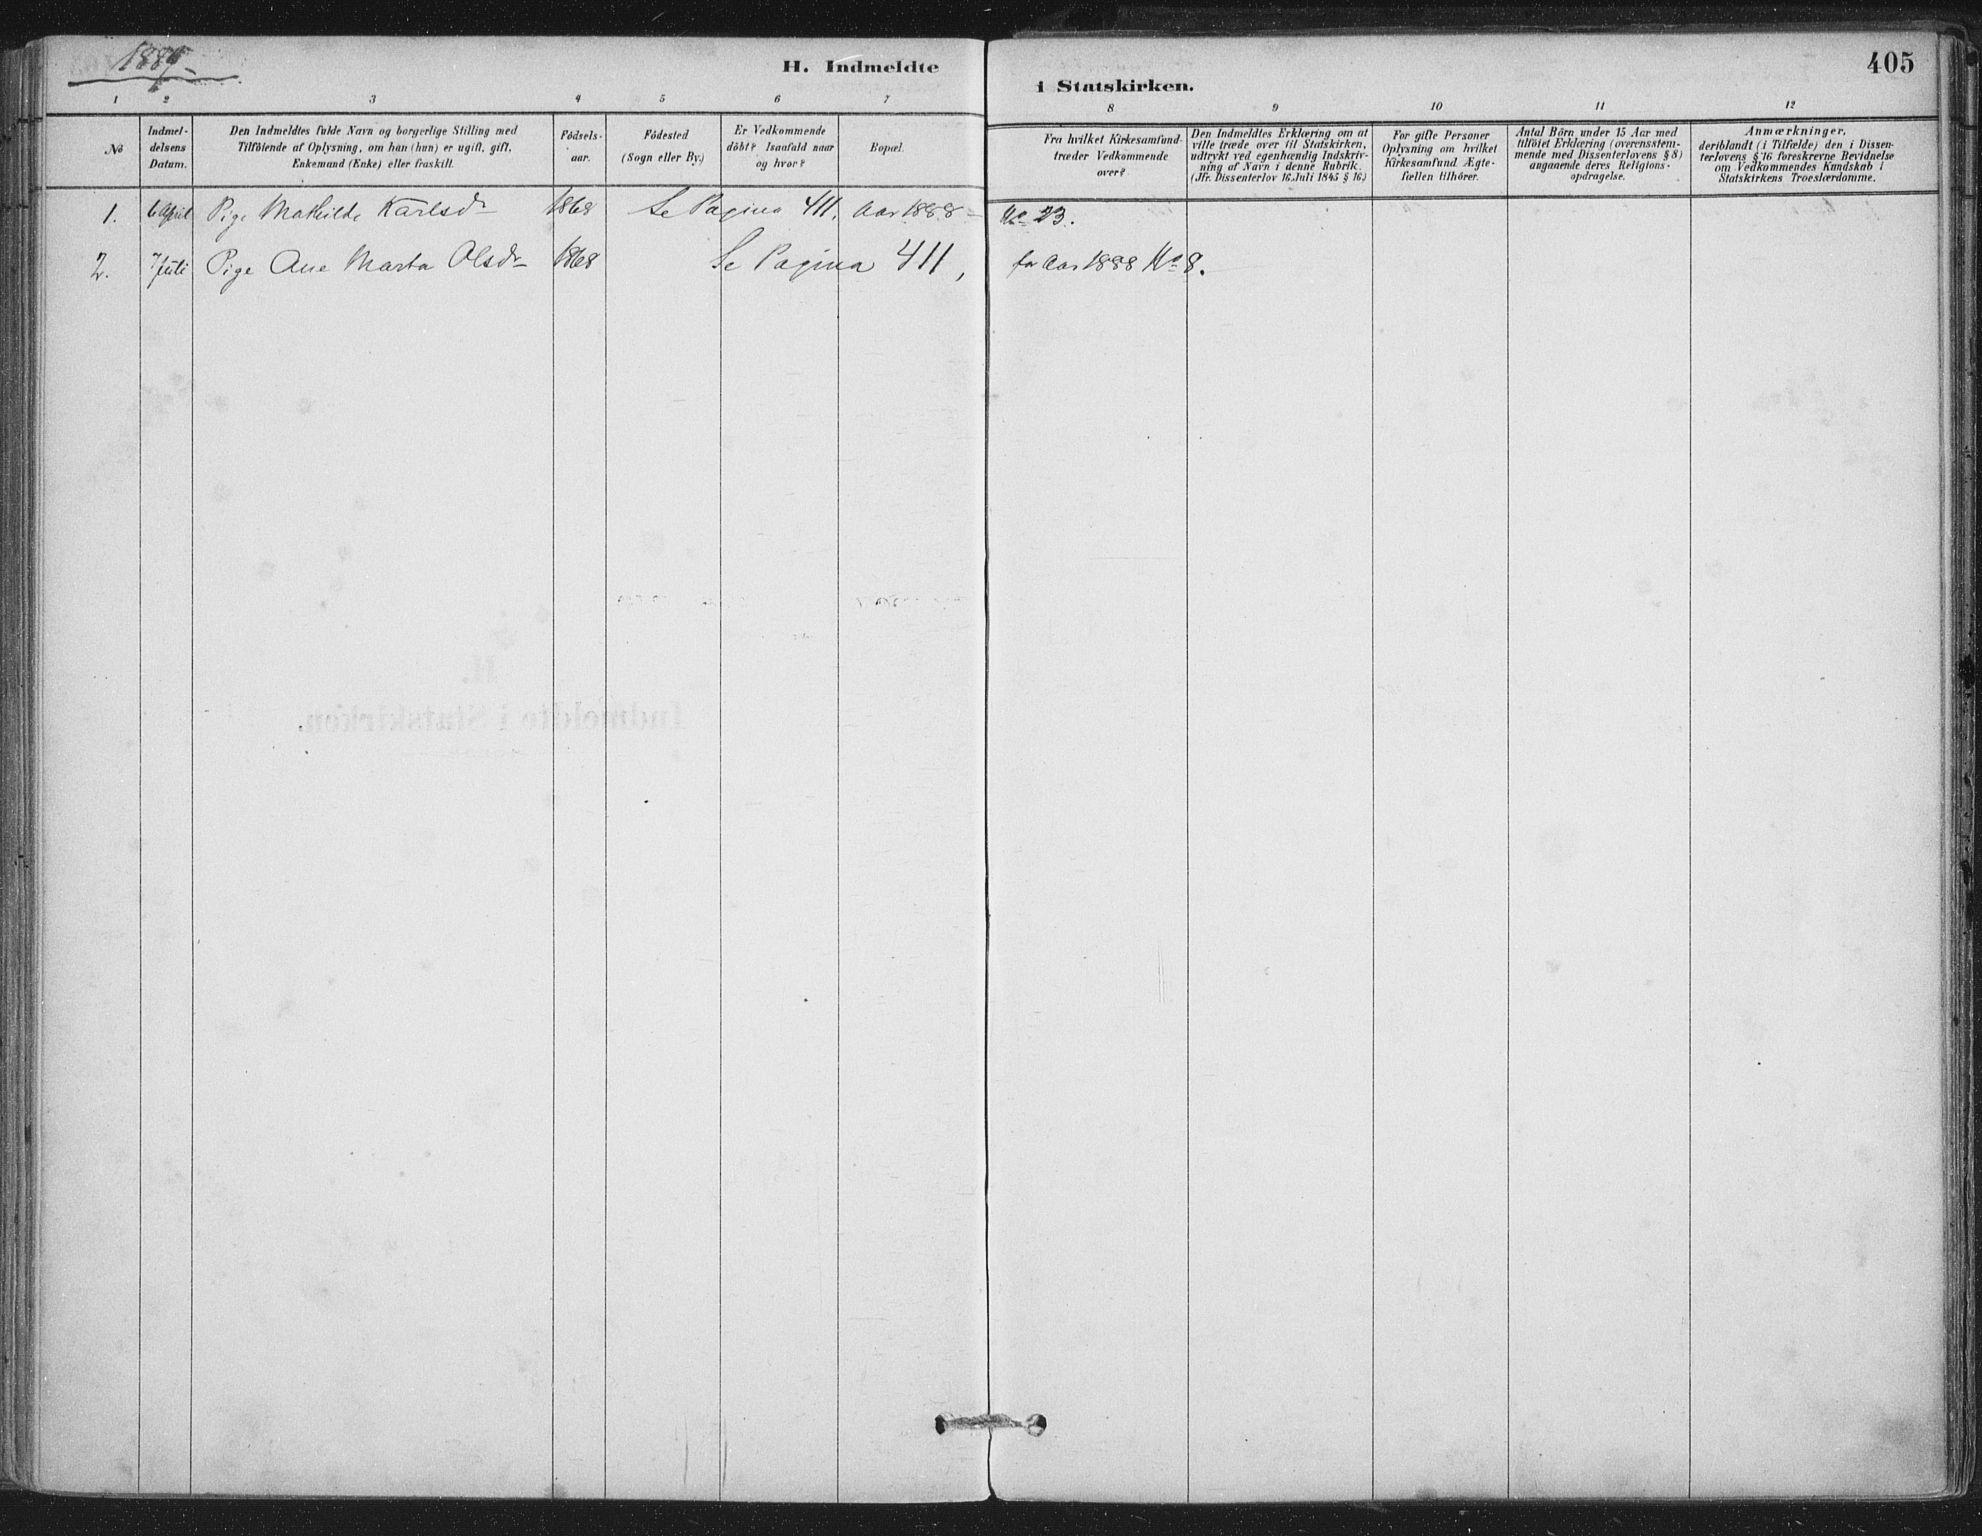 SAT, Ministerialprotokoller, klokkerbøker og fødselsregistre - Nordland, 888/L1244: Ministerialbok nr. 888A10, 1880-1890, s. 405